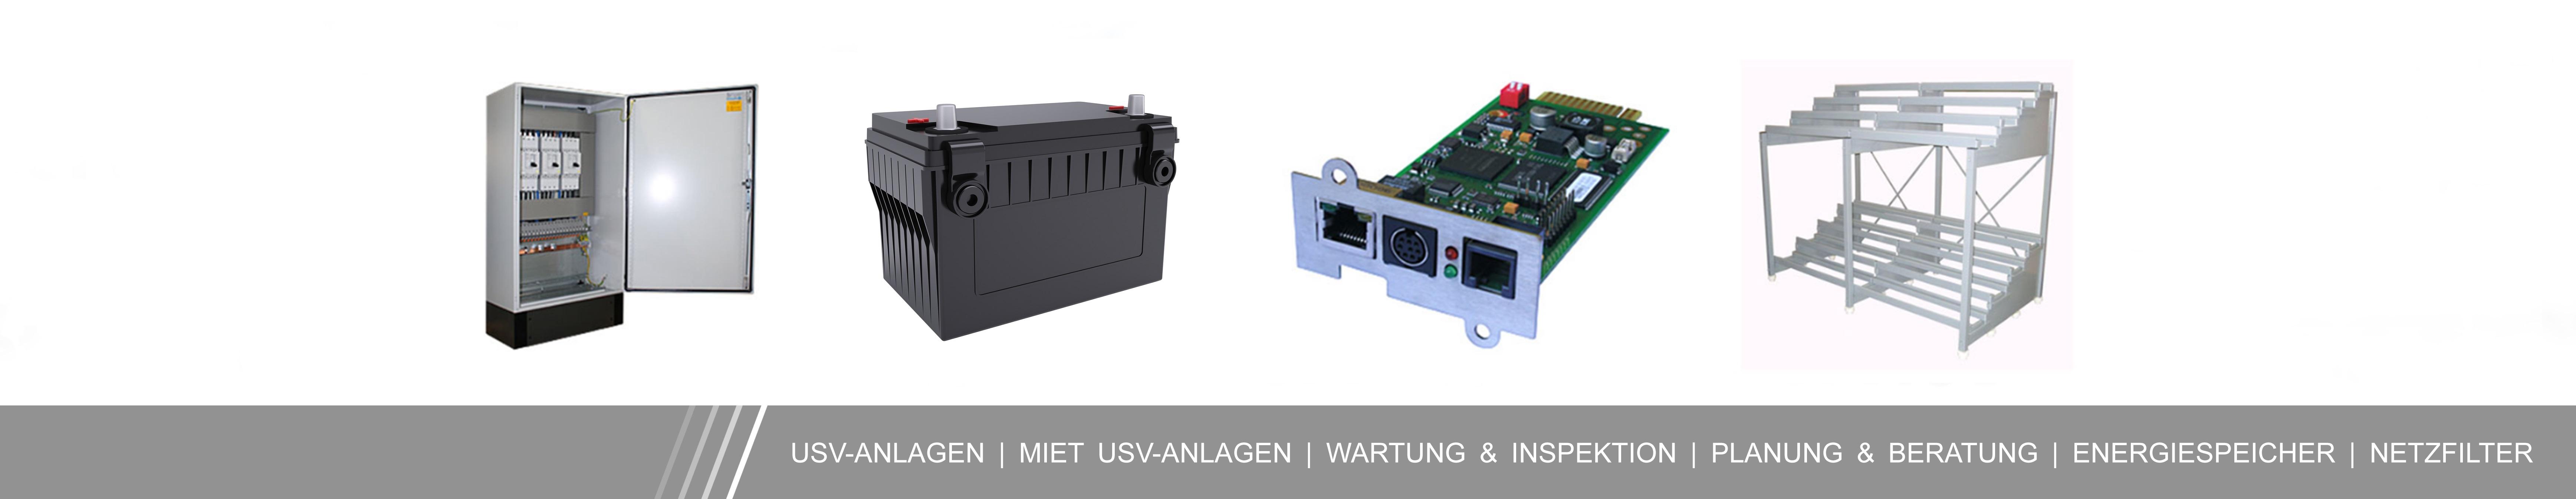 Zubehör - ROTON PowerSystems GmbH